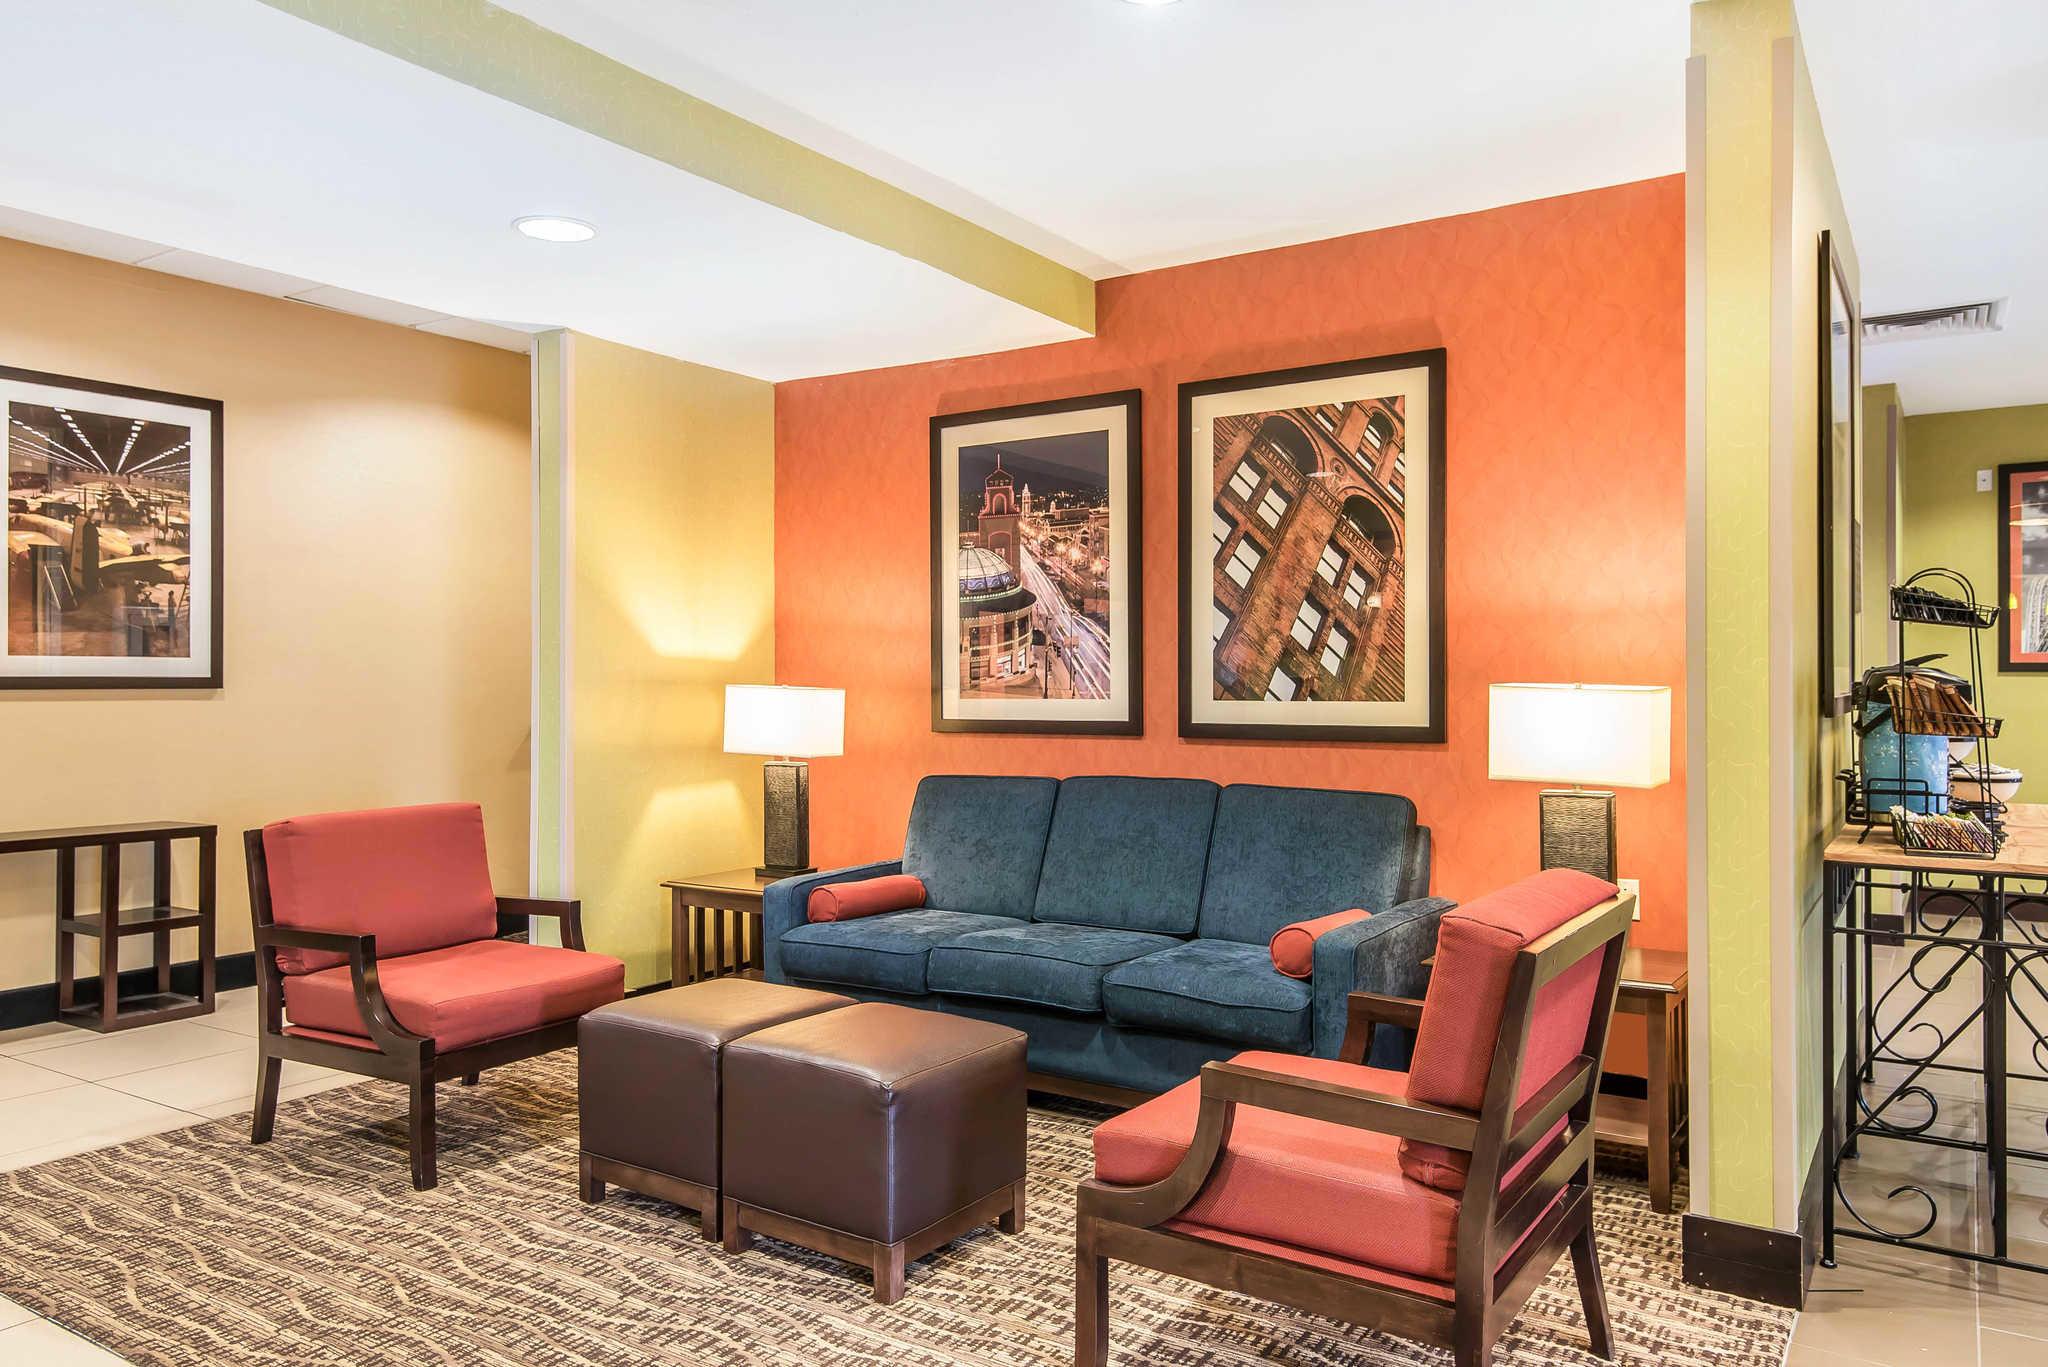 Comfort Inn & Suites Kansas City - Northeast image 5